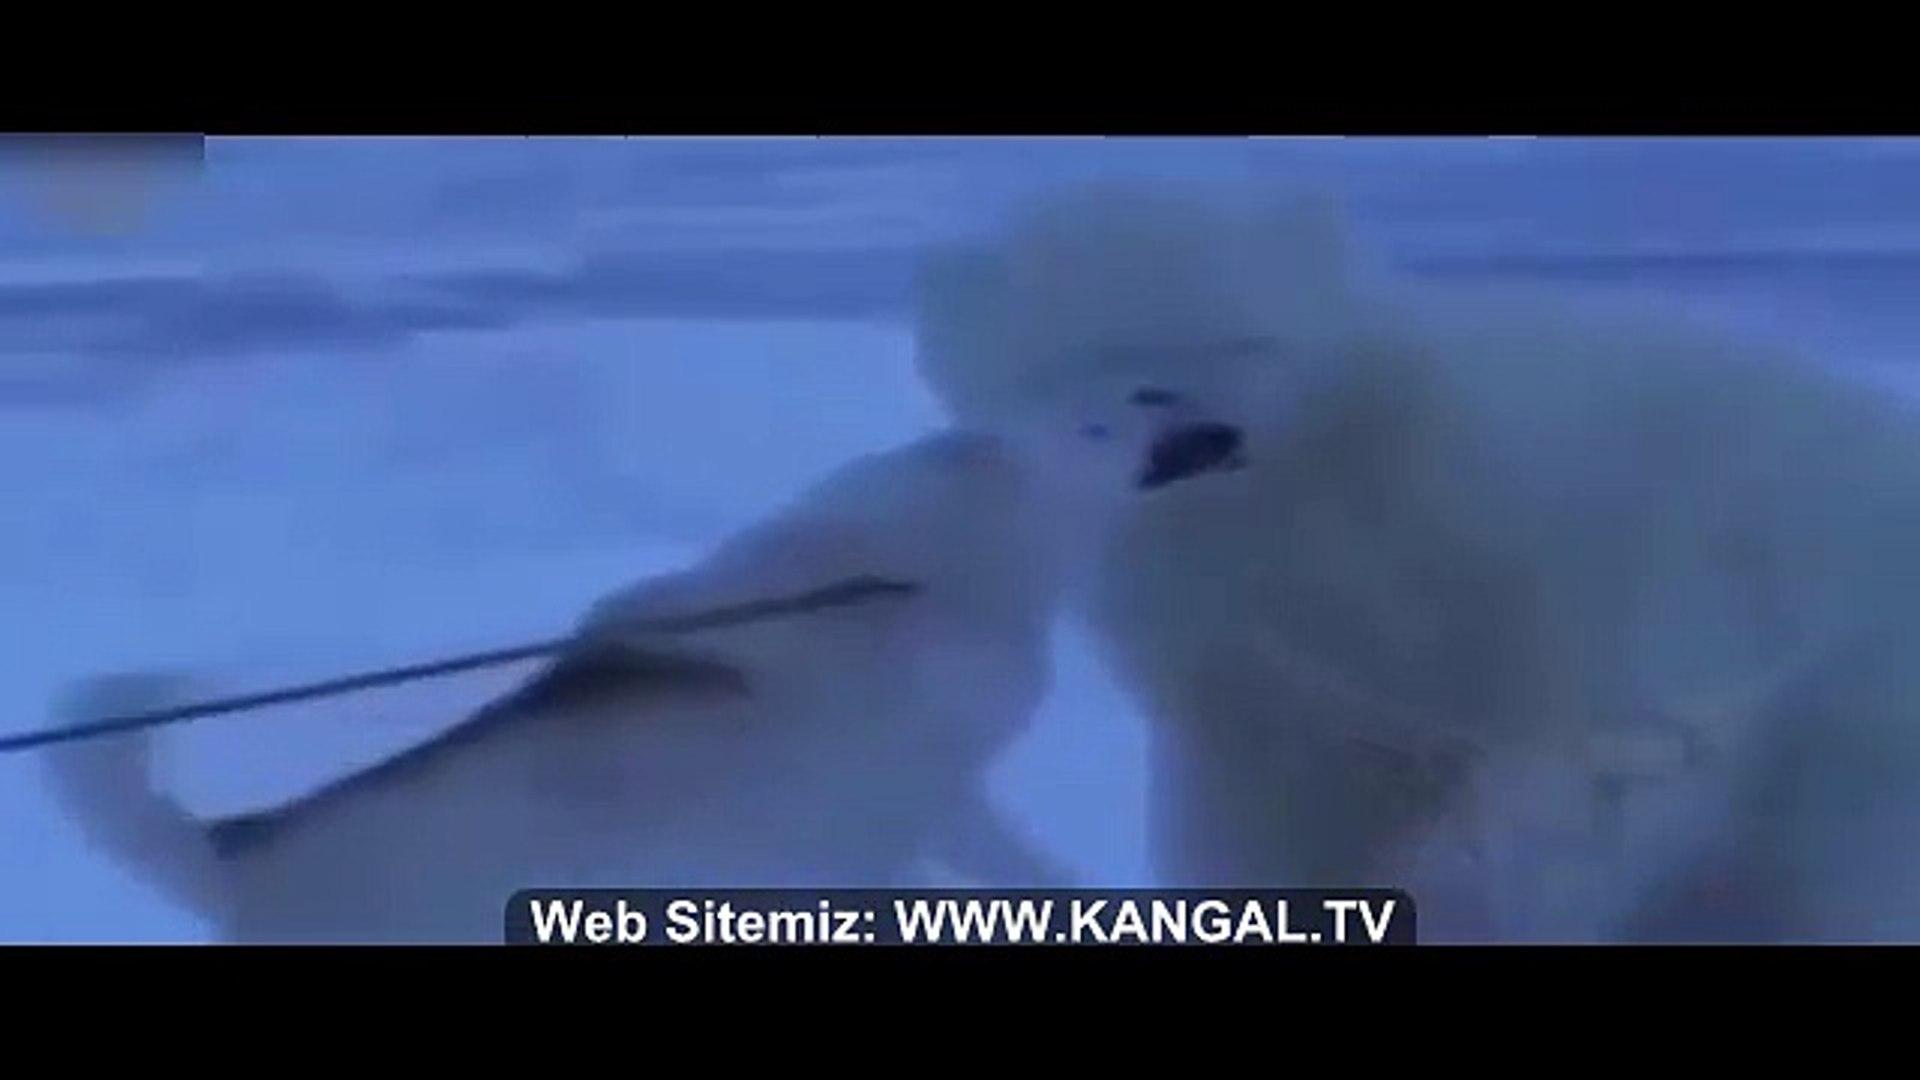 BEYAZ AYI vs SiBiRYA KURDU - WHiTE BEAR vs SiBERiAN WOLF